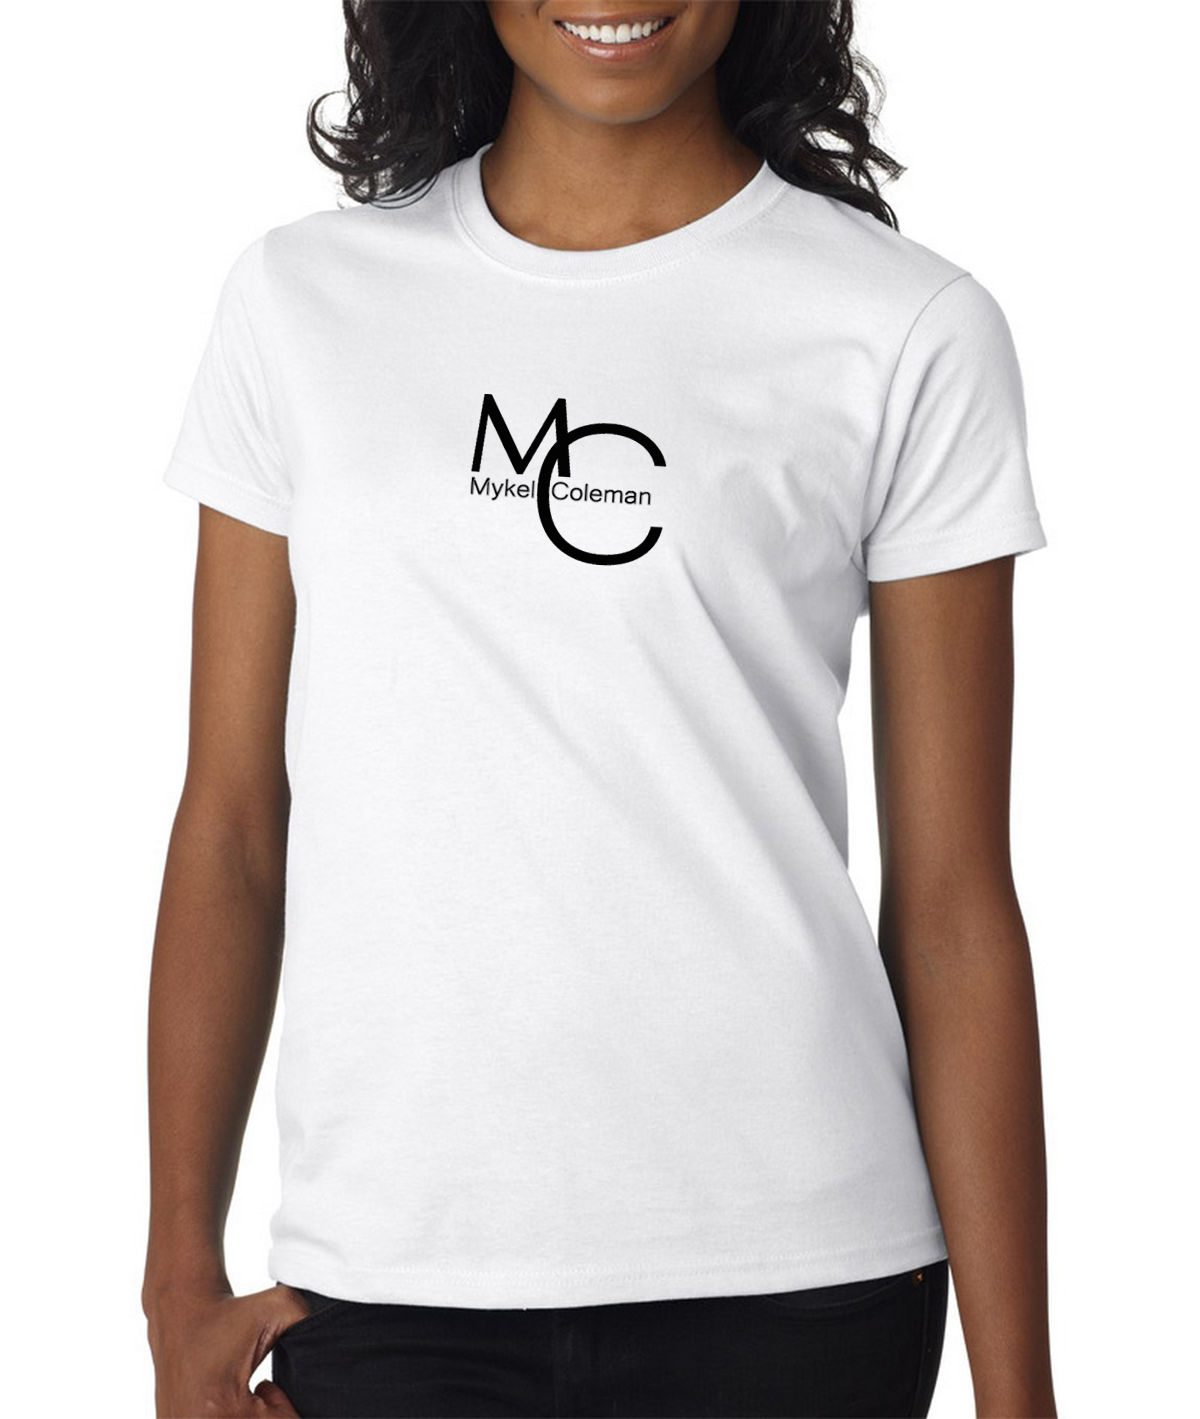 MC Mykel Coleman Shirt